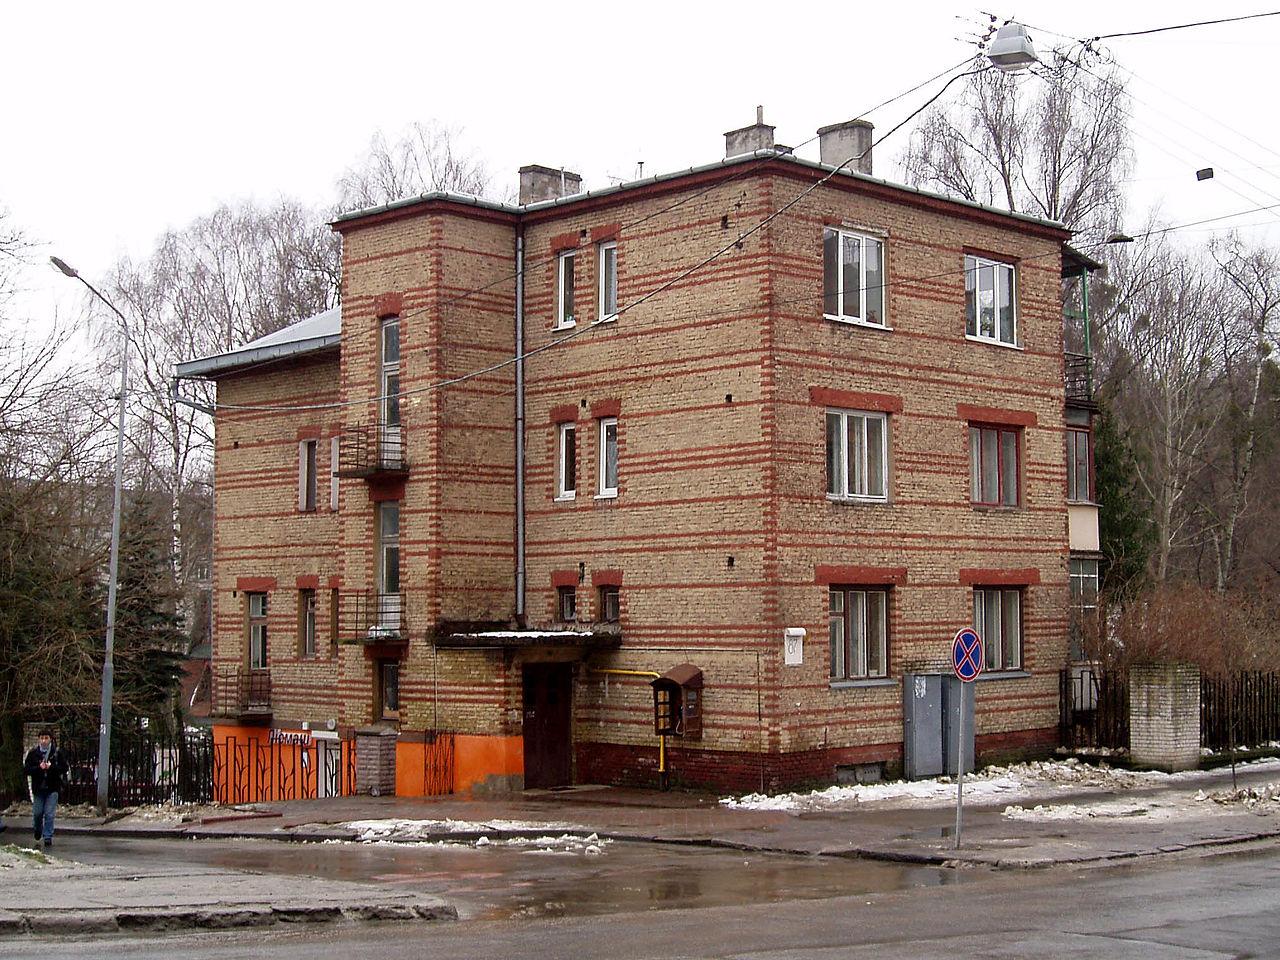 1280px-87_Chuprynky_Street,_Lviv_(01).jpg